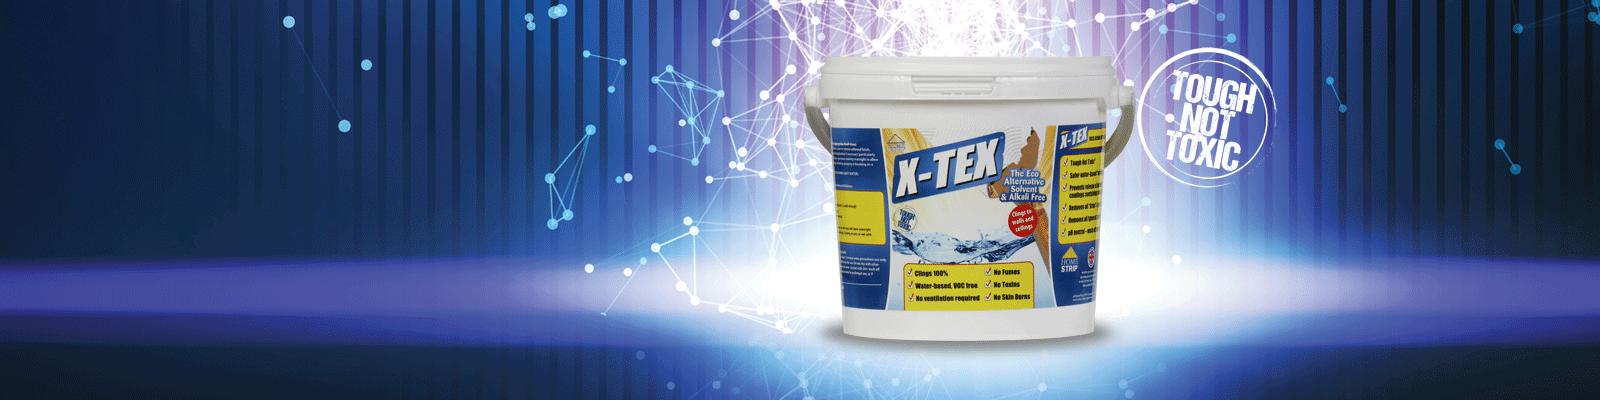 best artex polytex remover UK